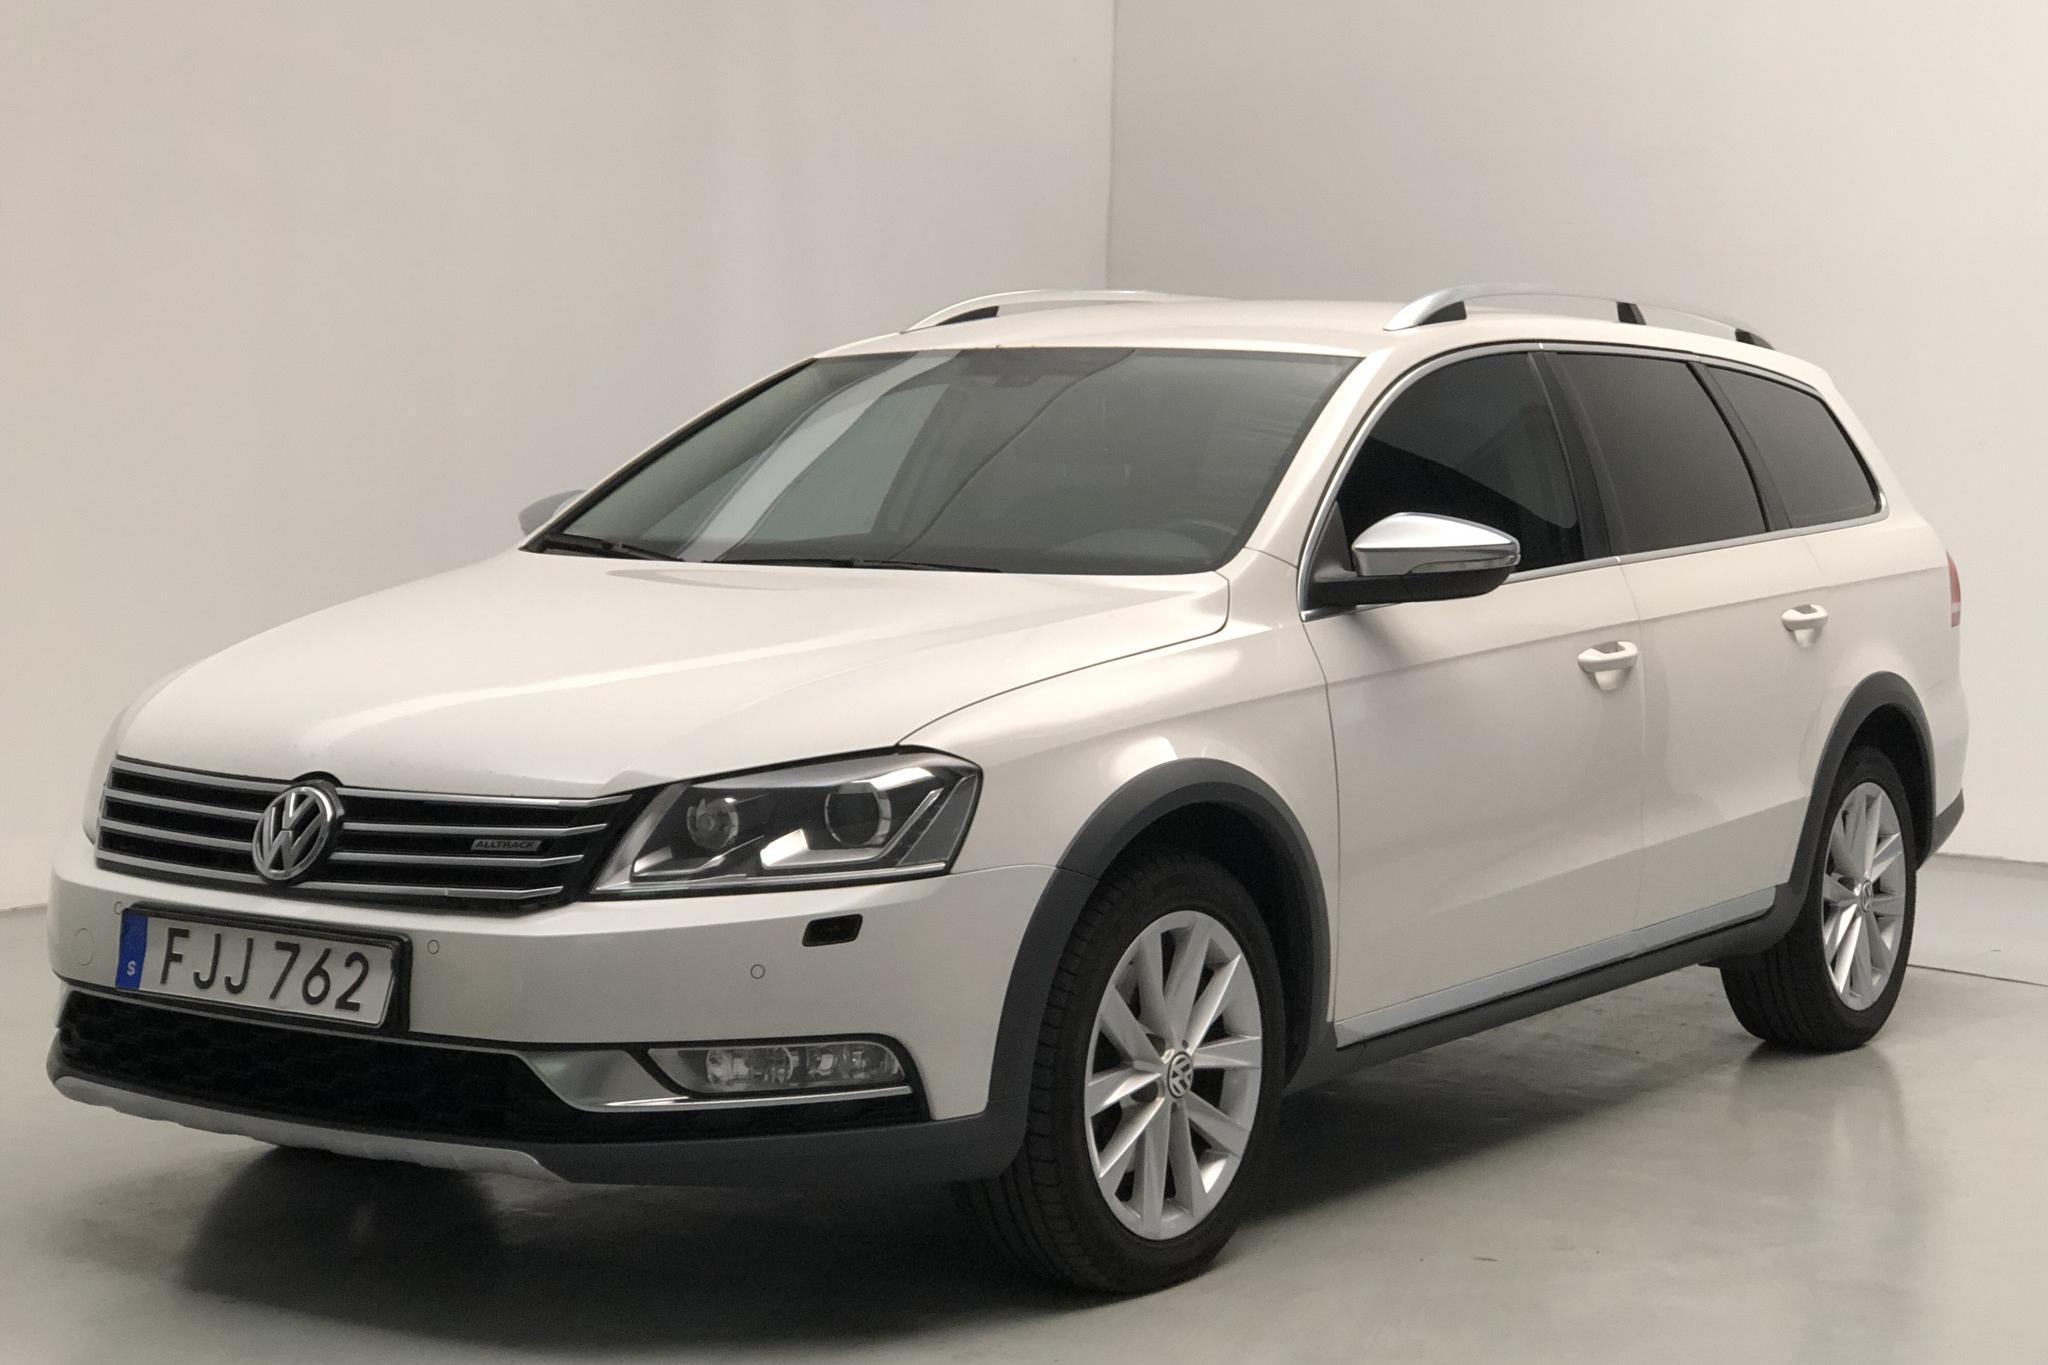 VW Passat Alltrack 2.0 TDI BlueMotion Technology 4Motion (177hk) - 158 060 km - Automatic - white - 2014